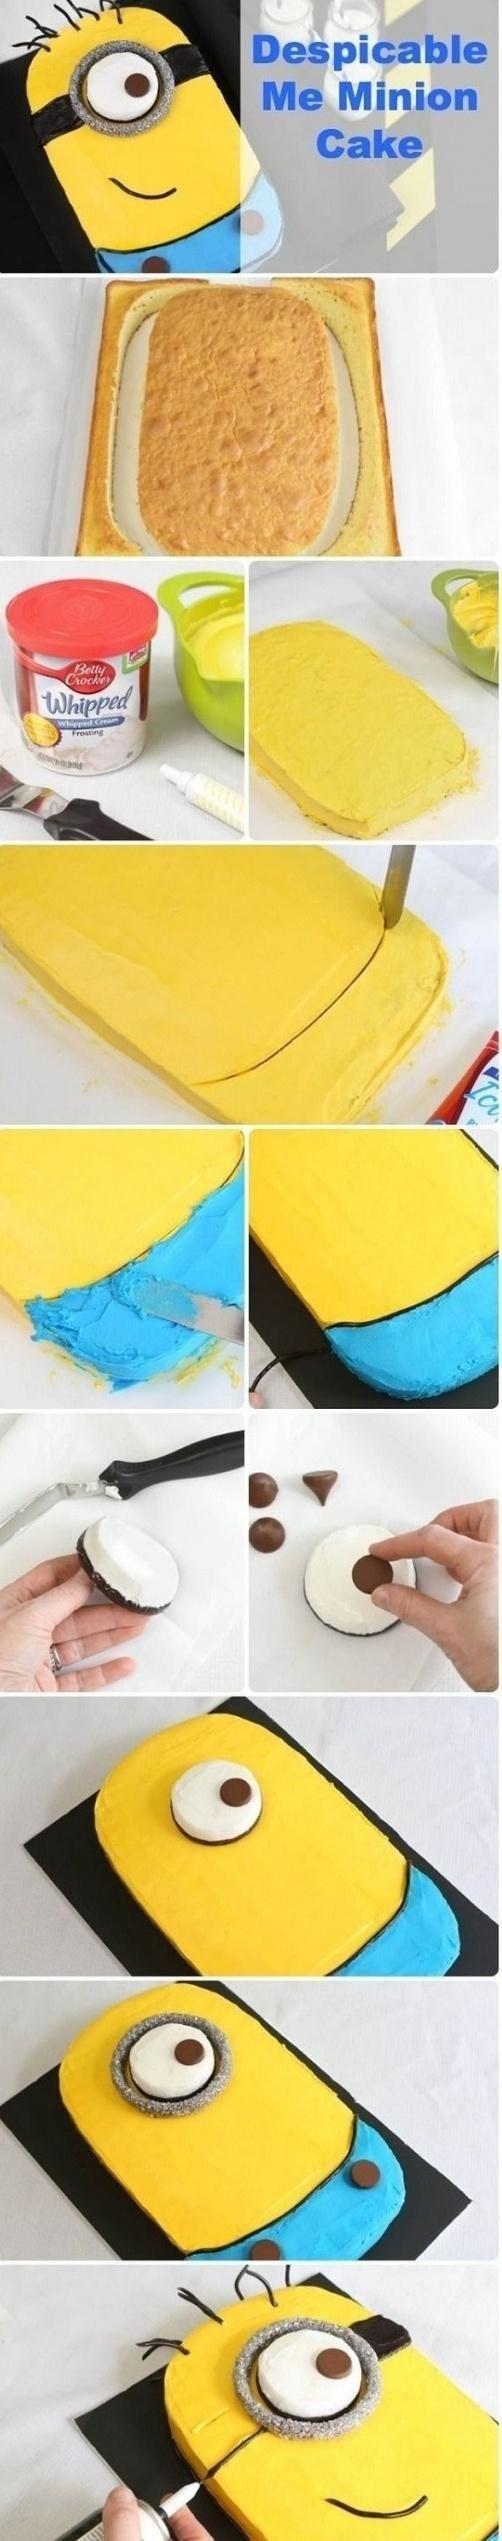 minion-pastel